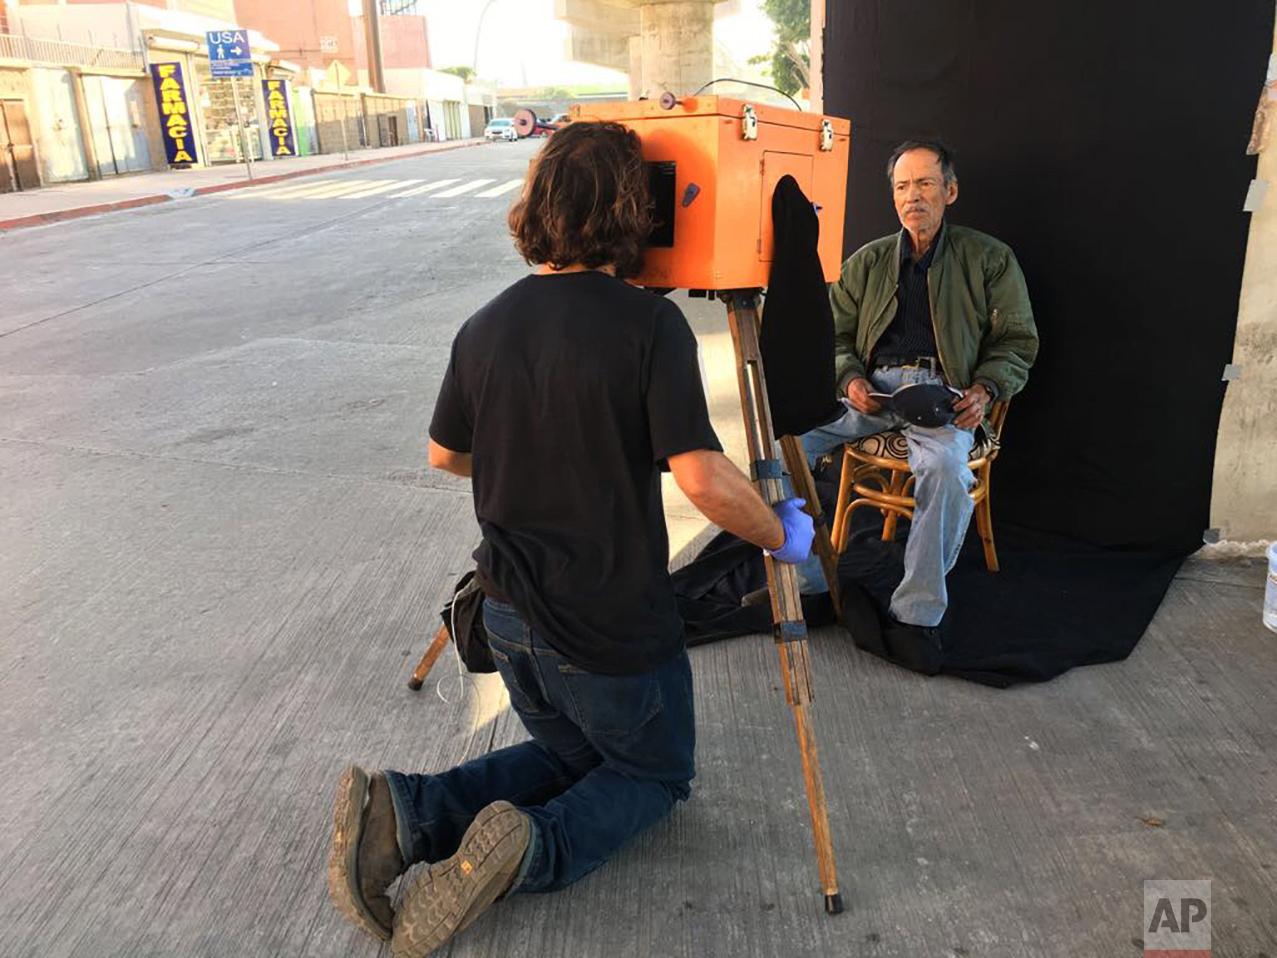 AP photographer Rodrigo Abd uses a wooden box camera to make a portrait of Mexican retiree Miguel Trejo, in Tijuana, Mexico, Wednesday, April 5, 2017. (AP Photo/Jordi Lebrija)